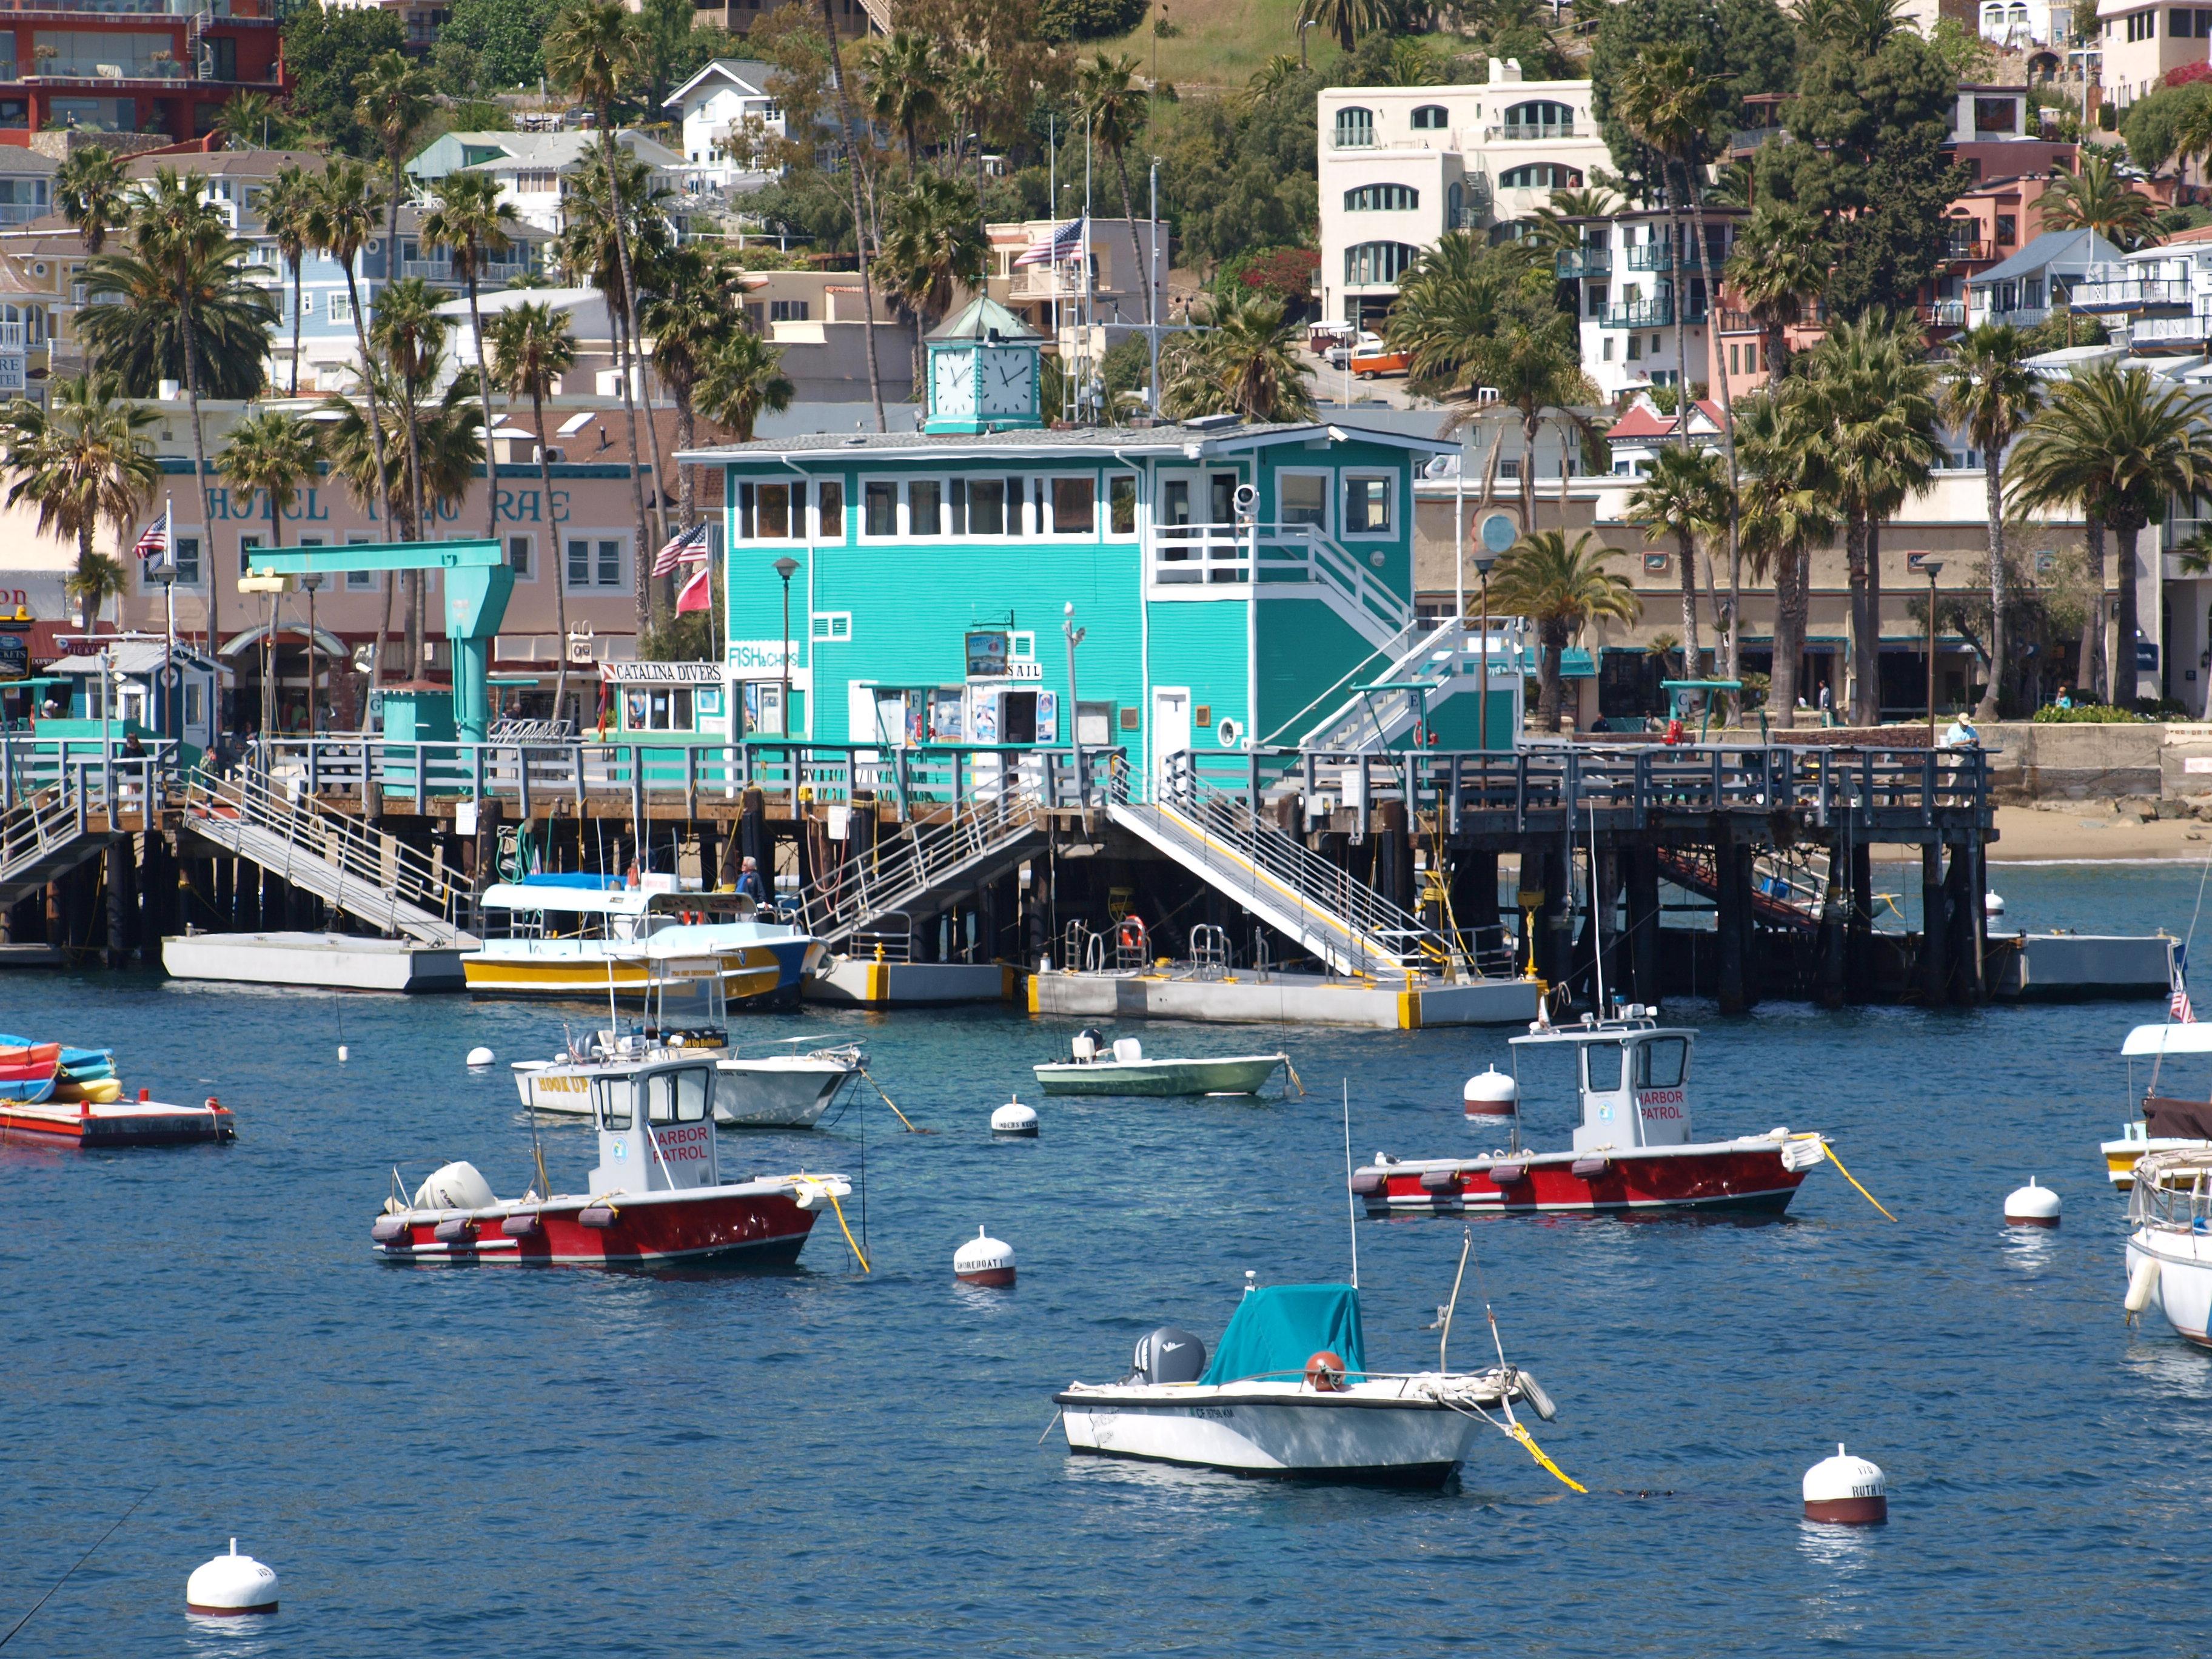 OLYMPUS DIGITAL CAMERA - Pier Fishing in California